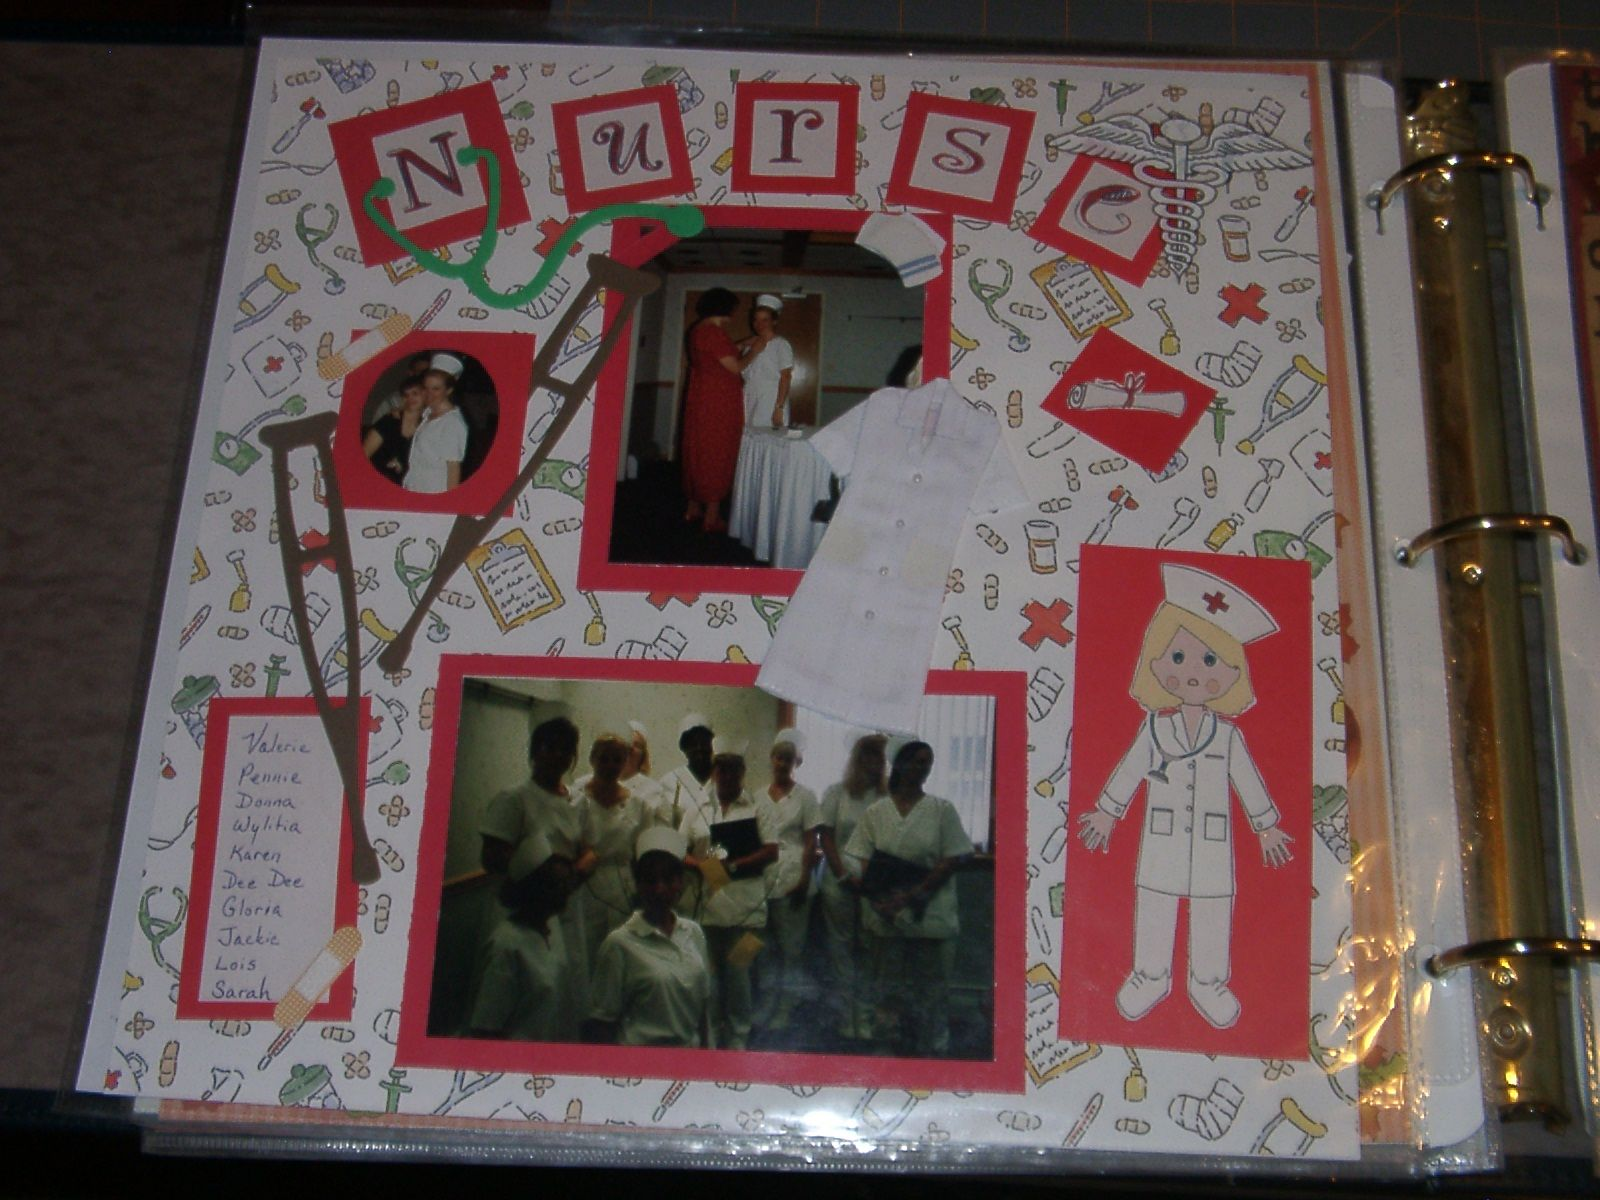 Graduation scrapbook ideas pinterest - Becoming A Nurse Scrapbook Com